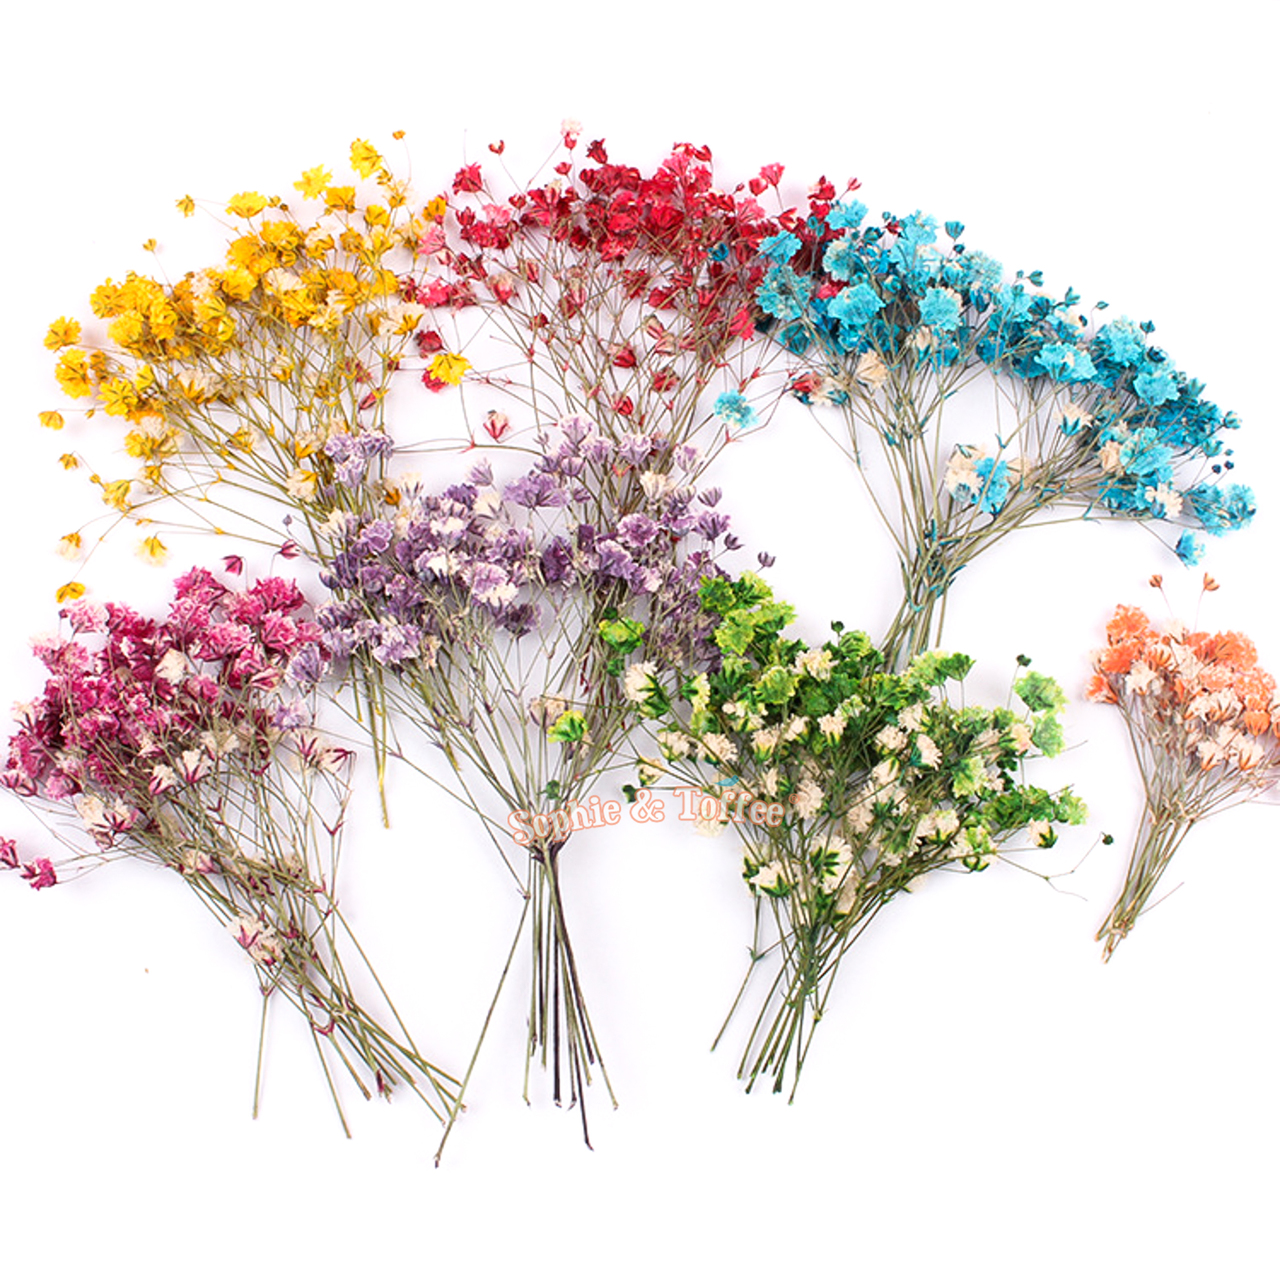 pressed flowers baby breath gypsophila mixed purple white yellow pink